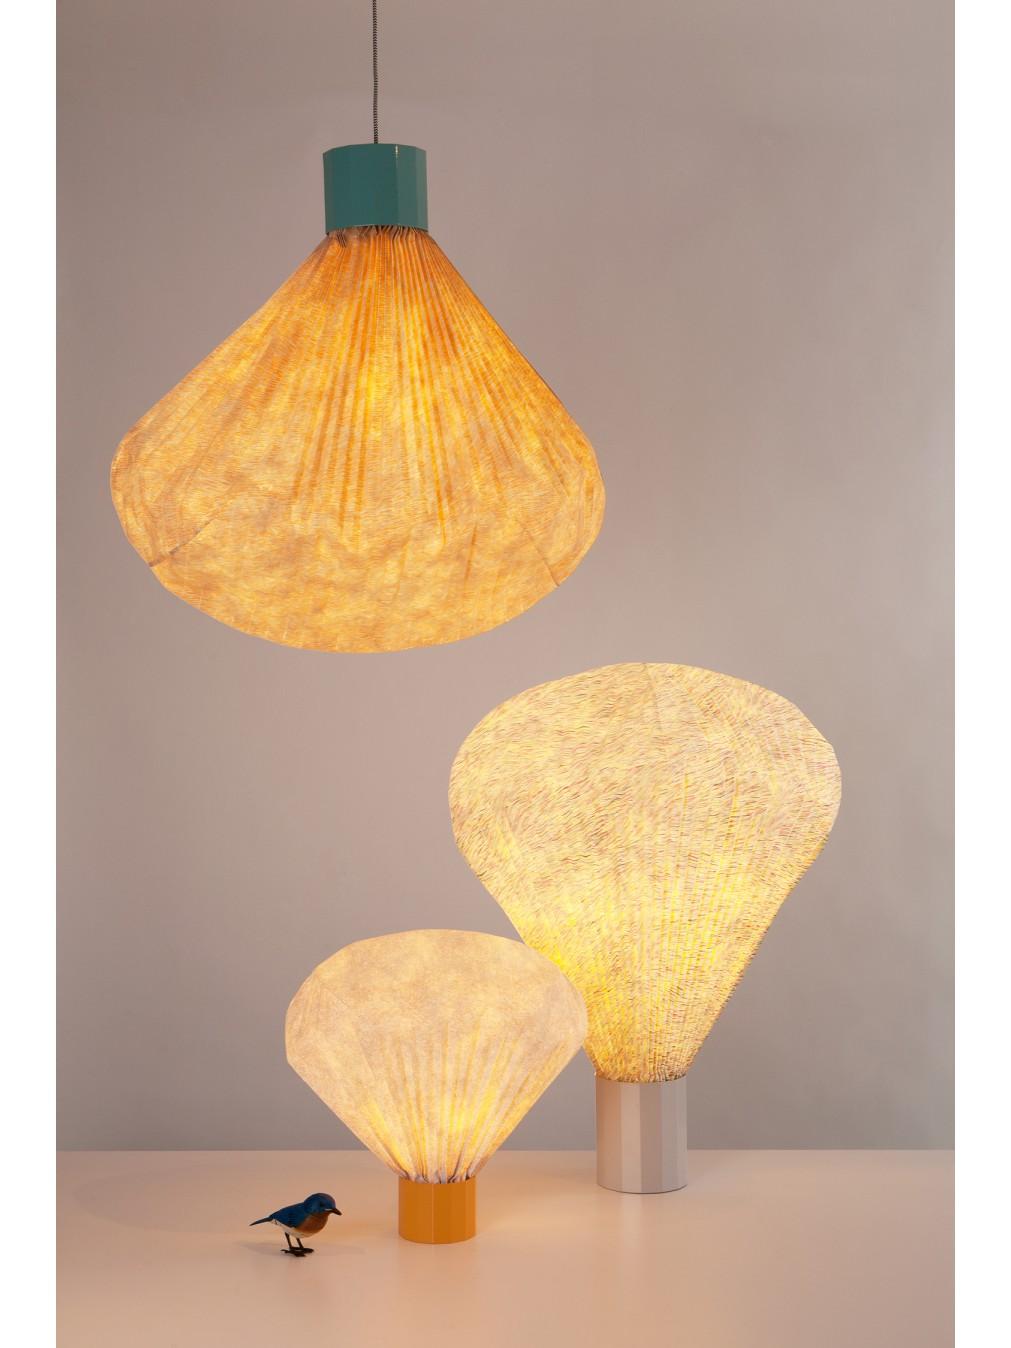 lampes de table inga semp lampe coloured vapeur. Black Bedroom Furniture Sets. Home Design Ideas